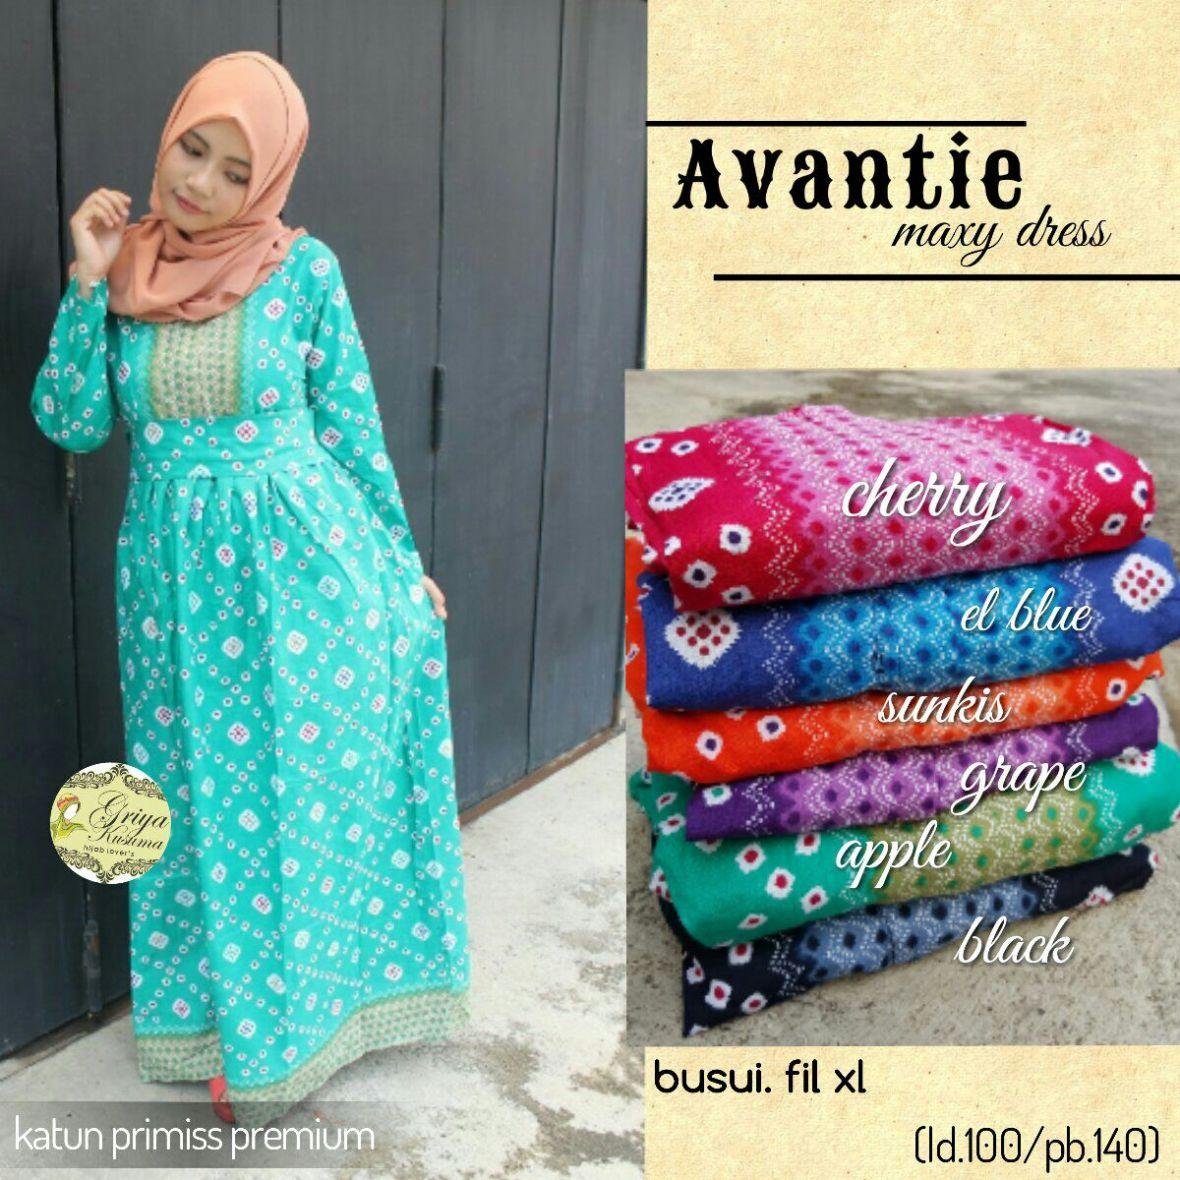 Avantie-maxy-dress